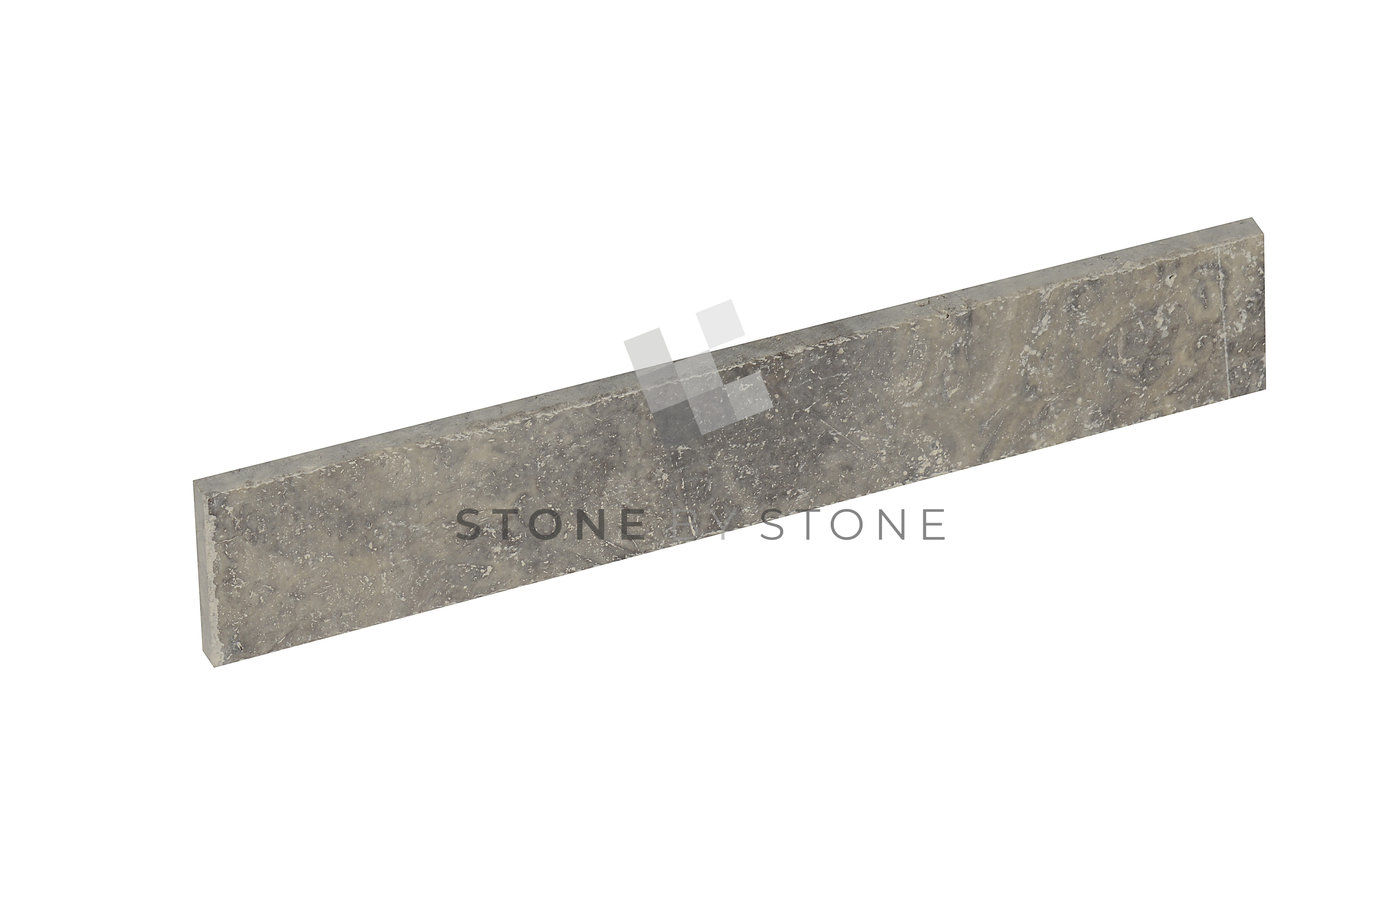 Plinthes 7x40/1cm - Travertin - Vieilli 1er Choix - Silver (Gris)